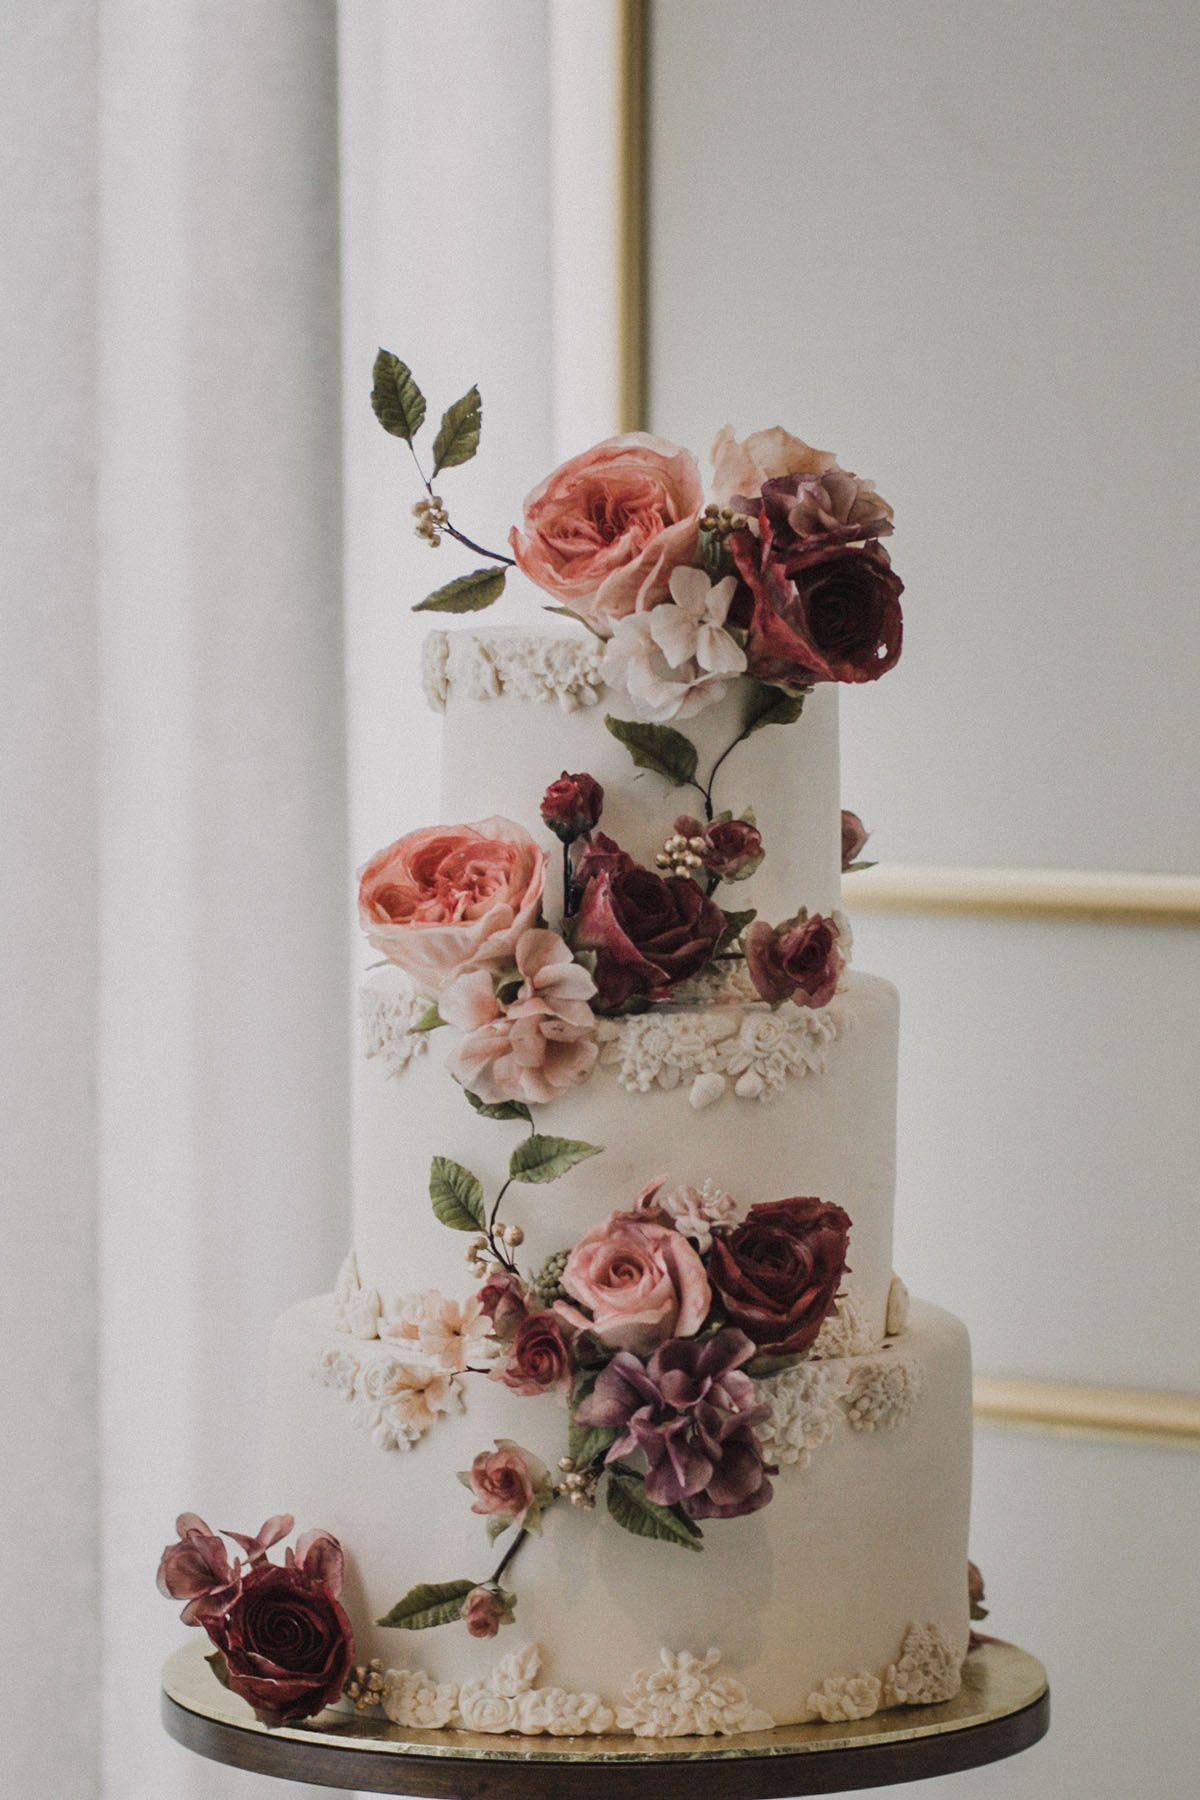 Gallery u cakes u winifred kriste cake unique cakes pinterest